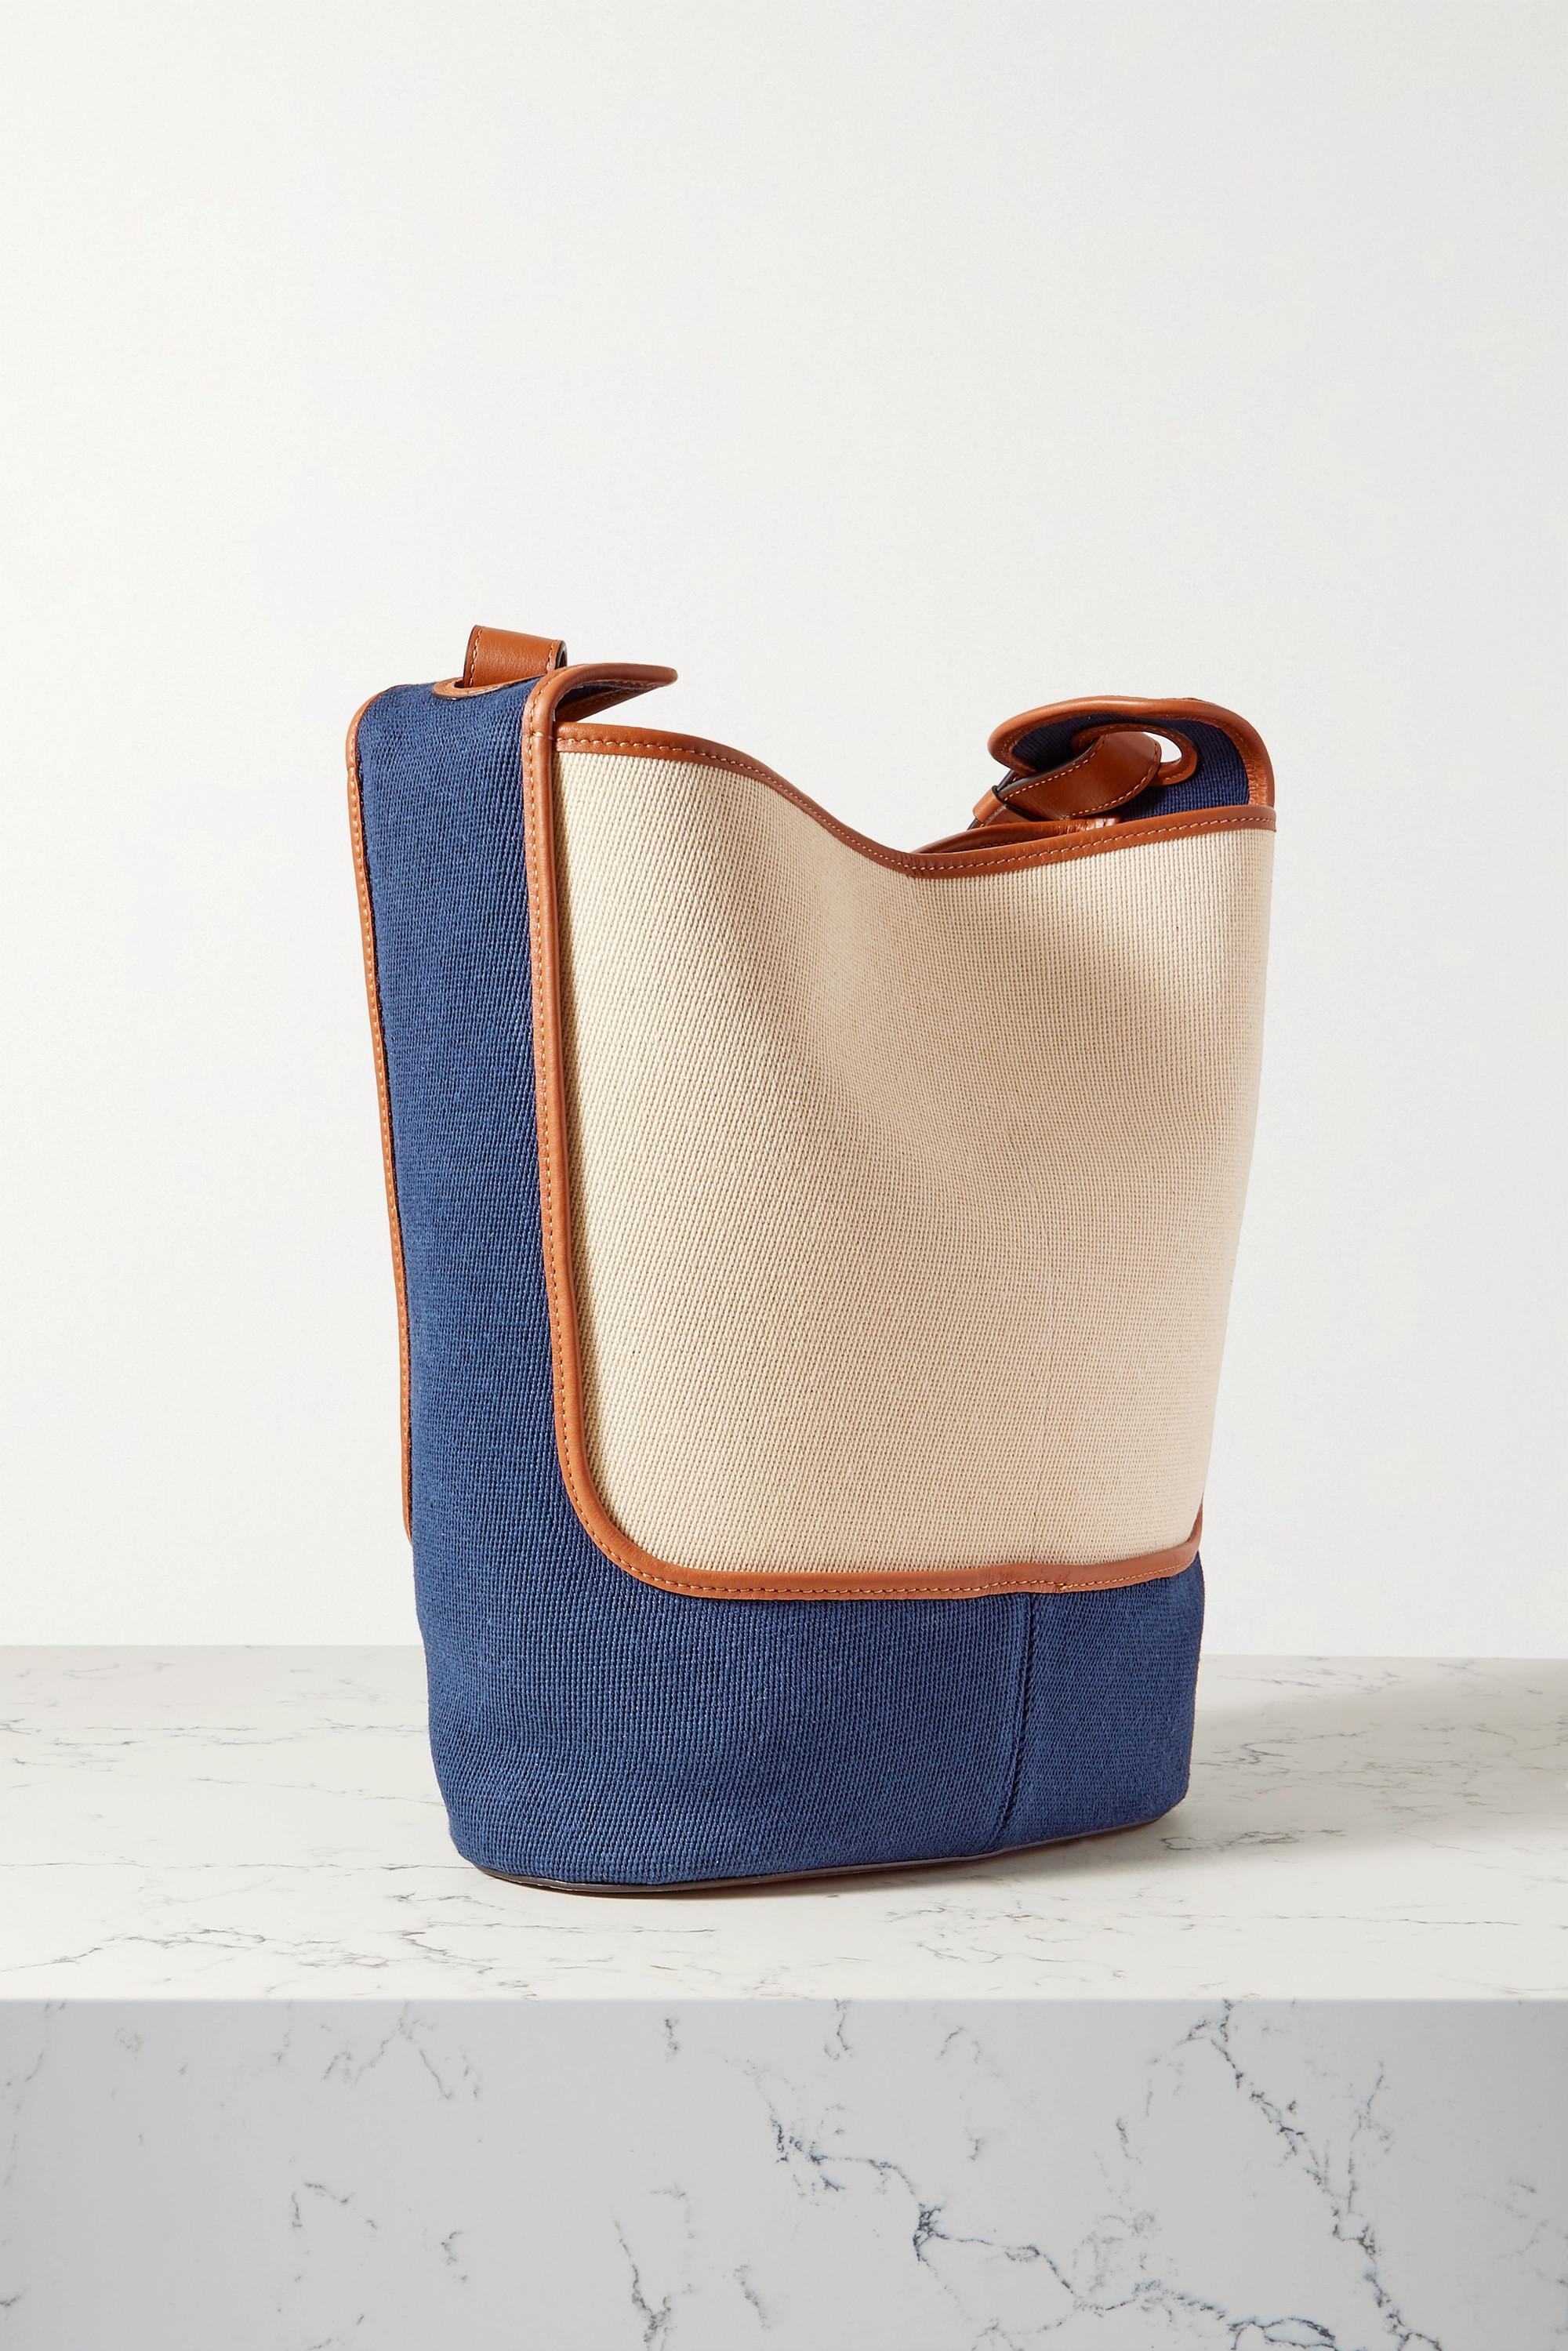 Loewe + Paula's Ibiza Balloon Hobo leather-trimmed cotton-canvas shoulder bag